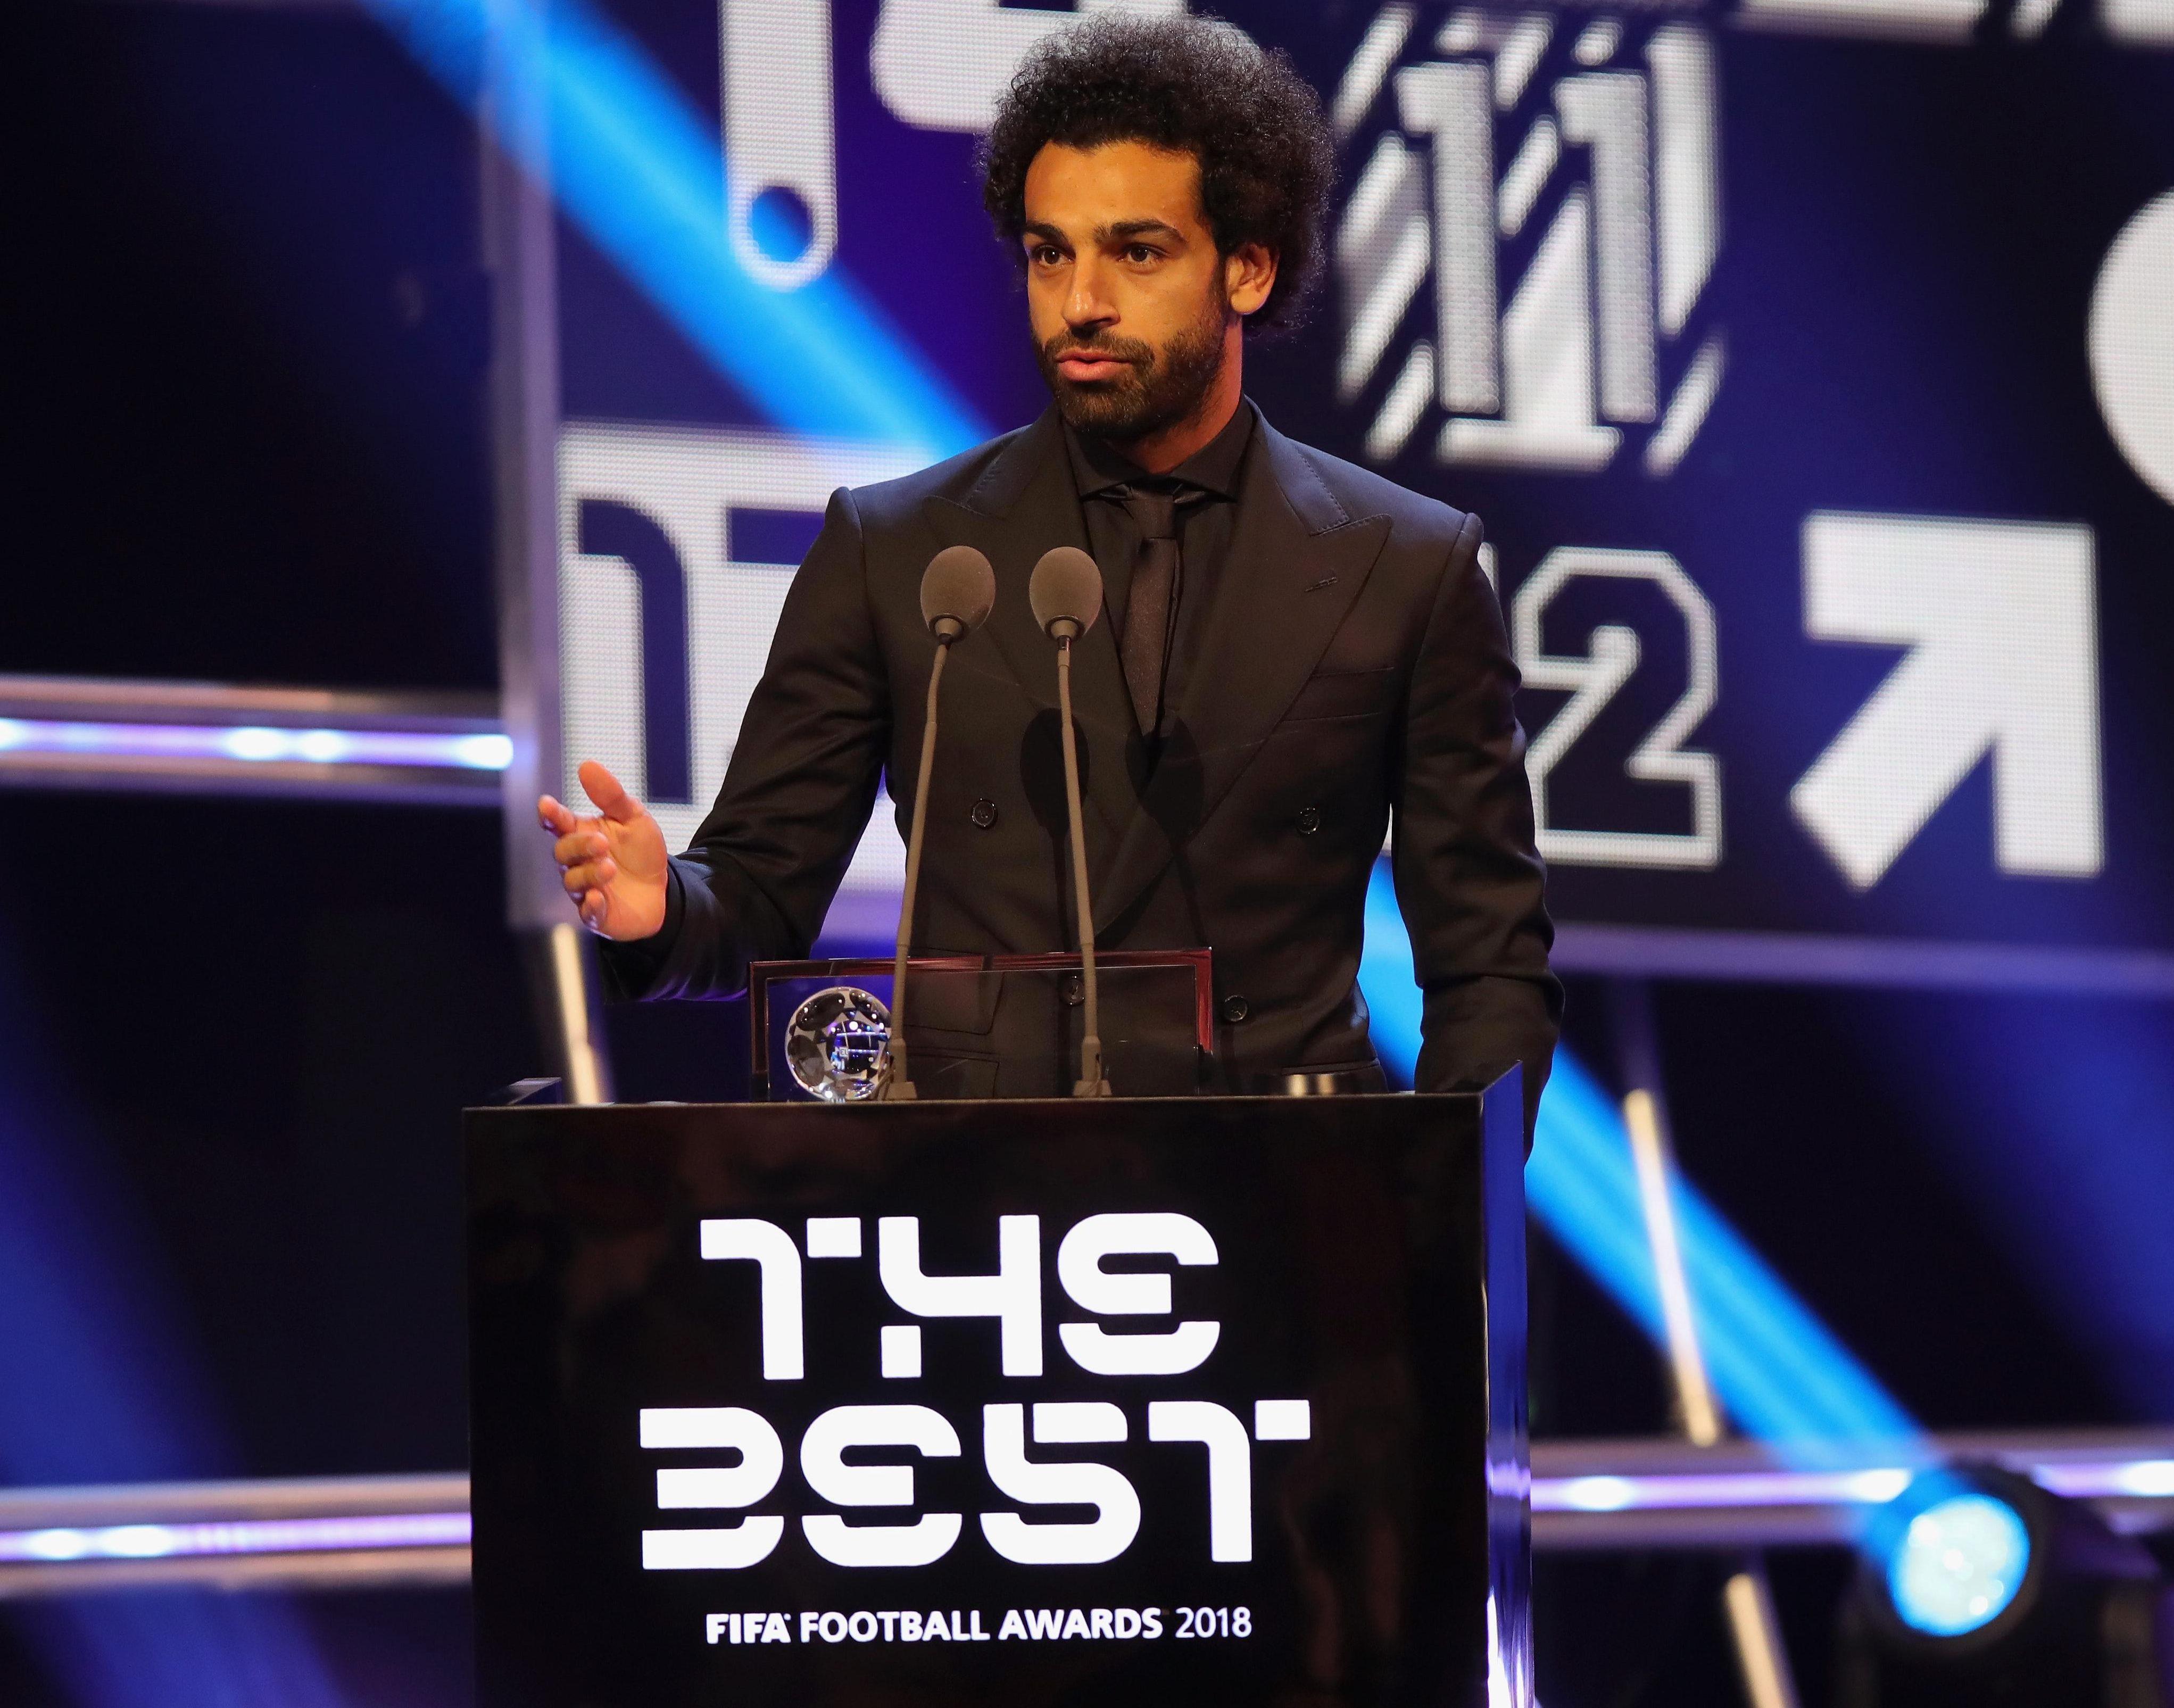 A reminder that Salah's fourth best goal of last season won the Puskas Award